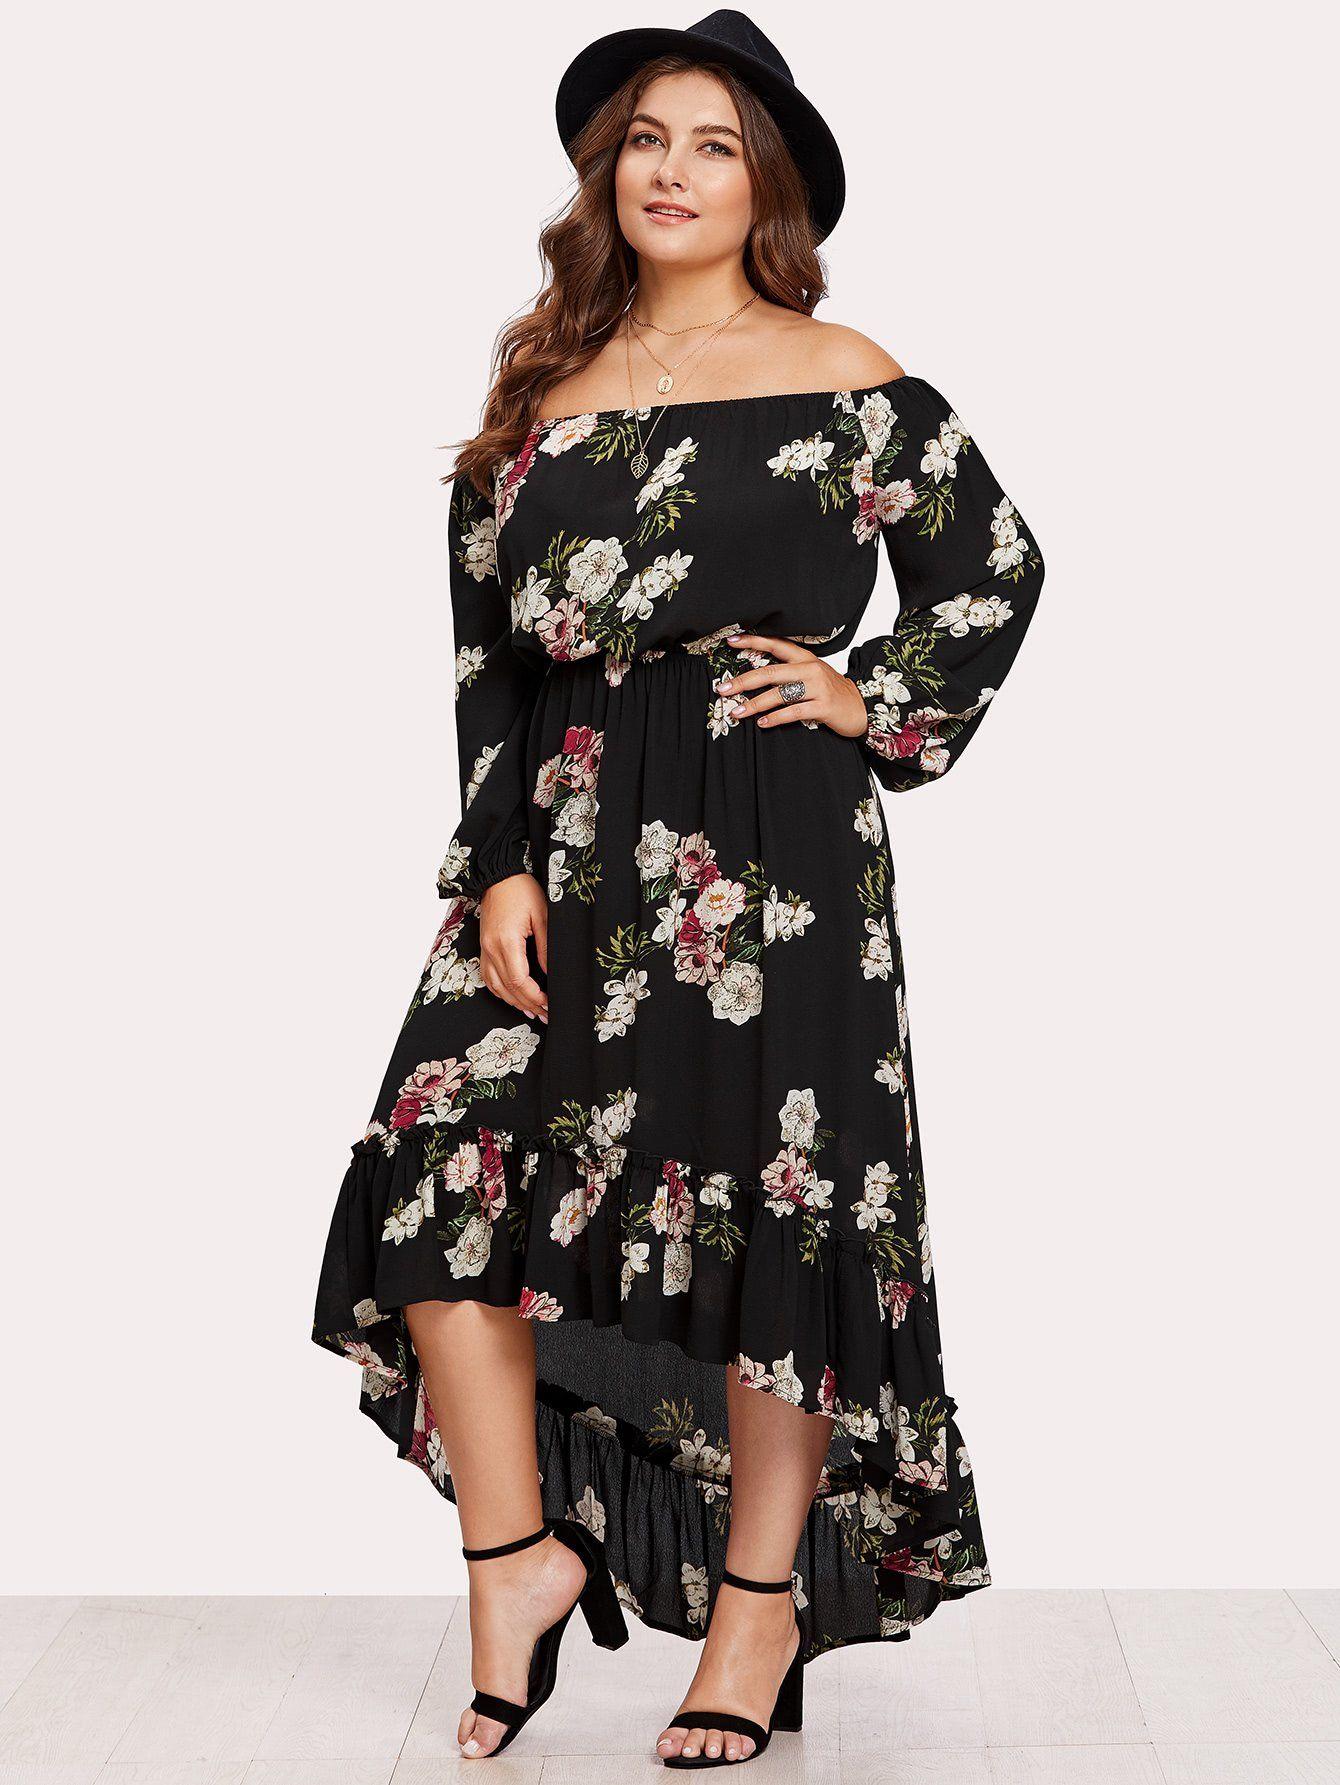 329202e41e2 Elasticized Waist Flounce Dip Hem Bardot Dress